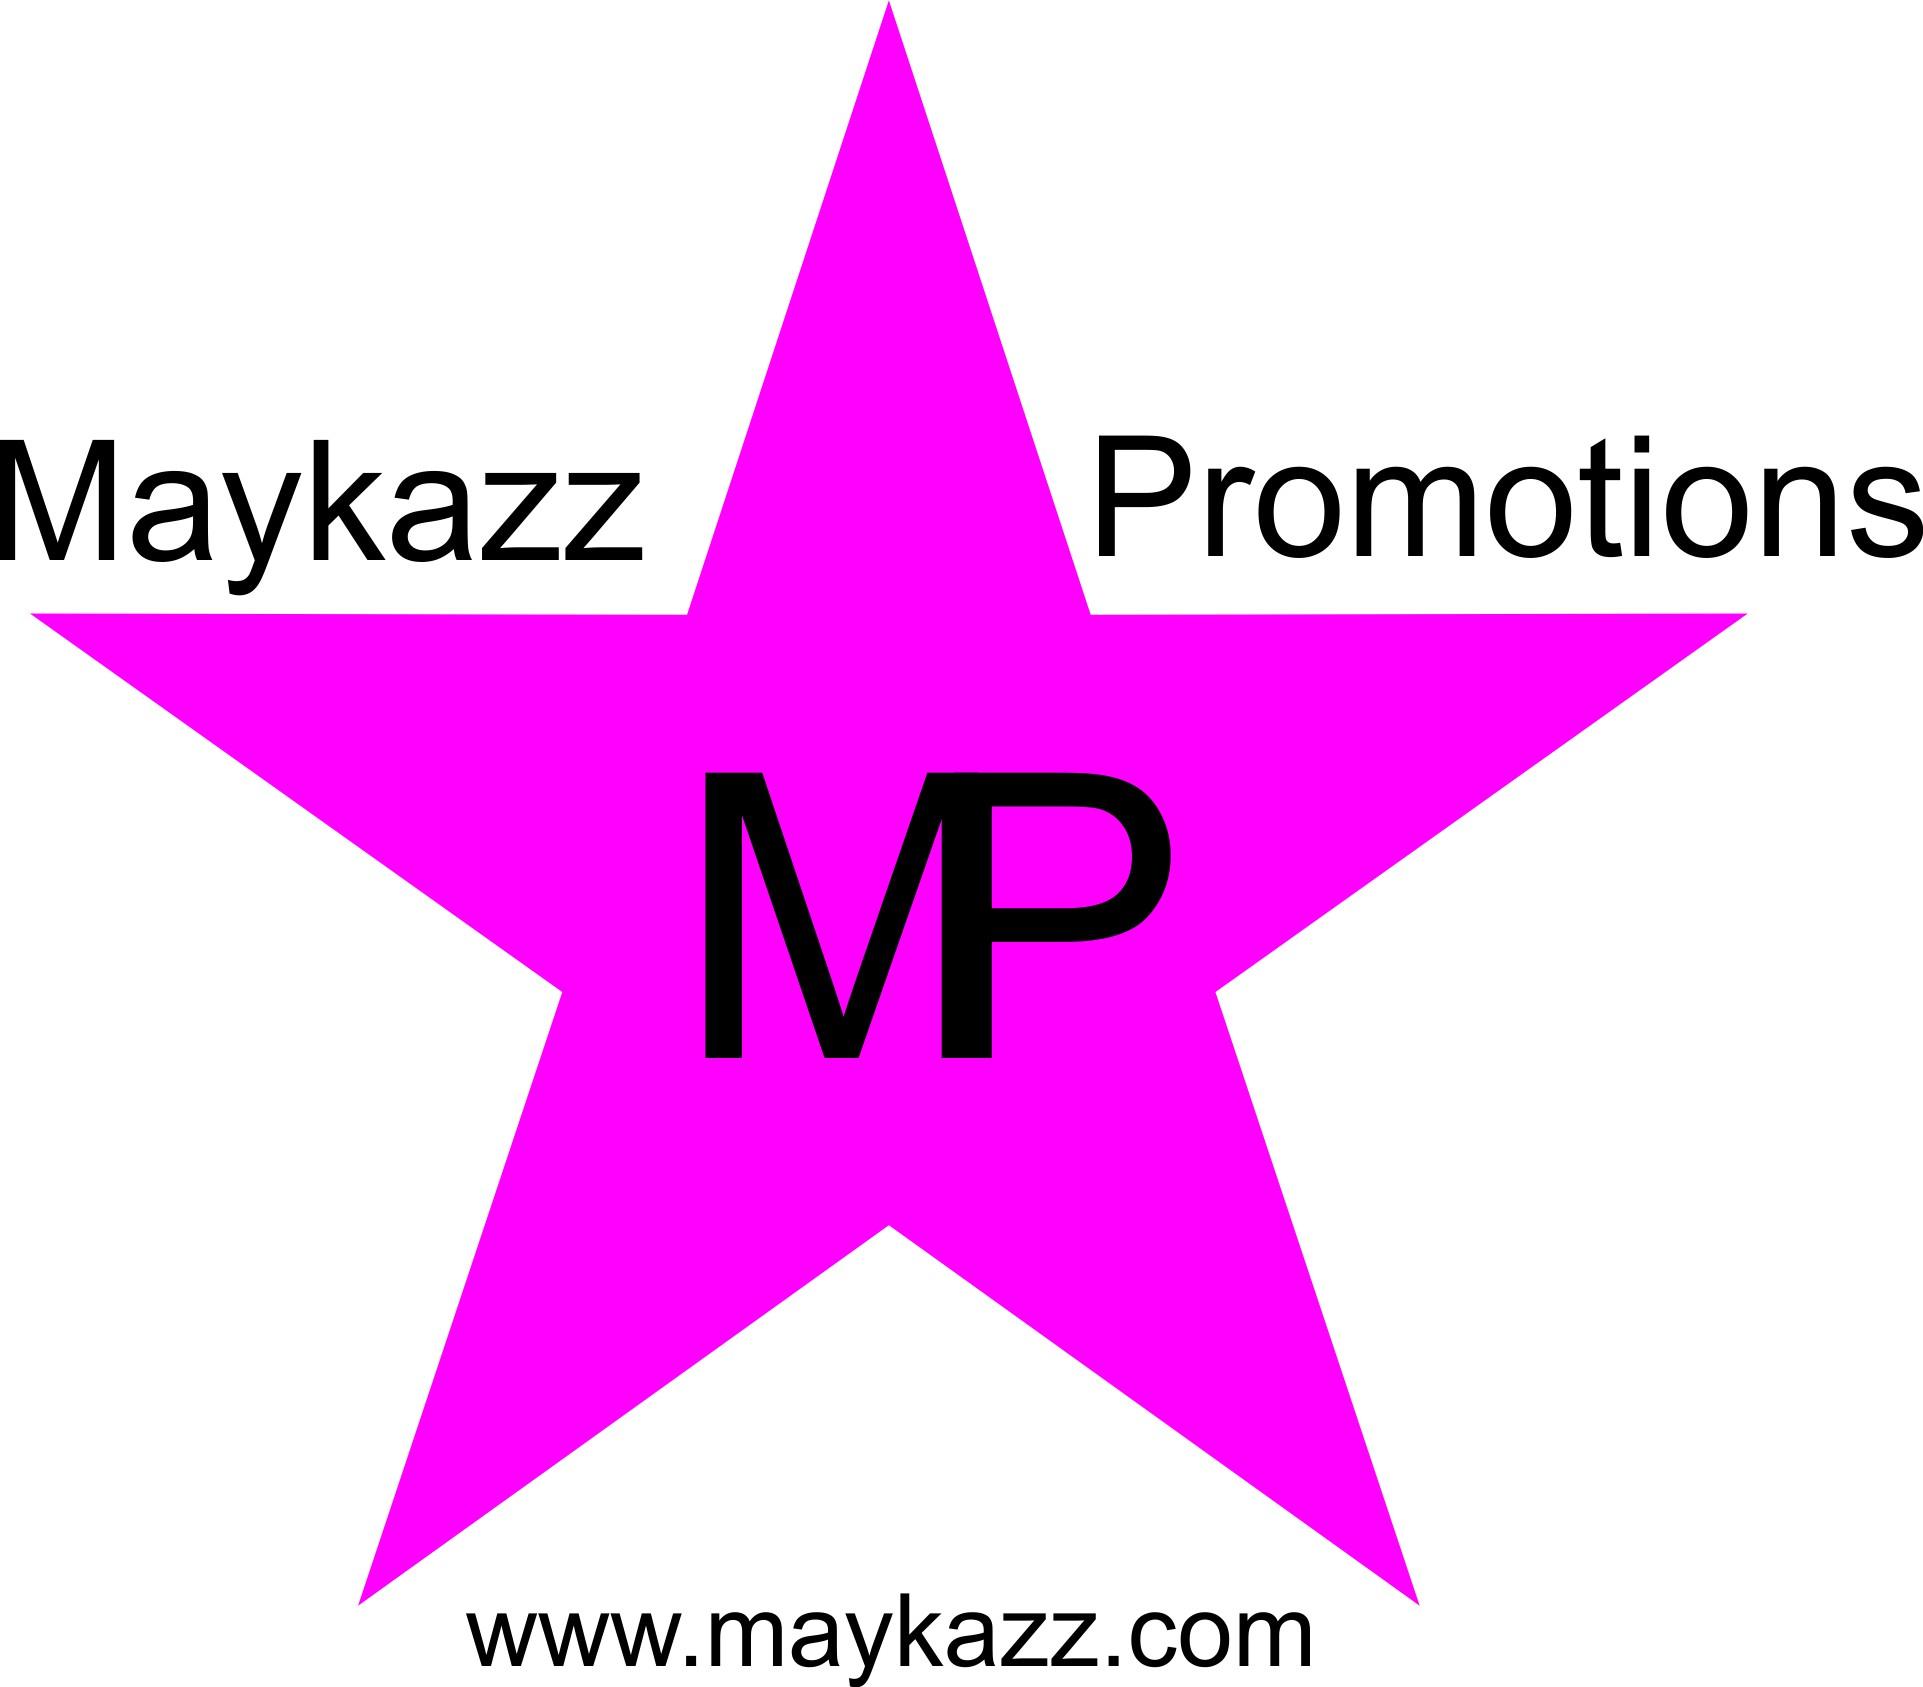 Maykazz logo